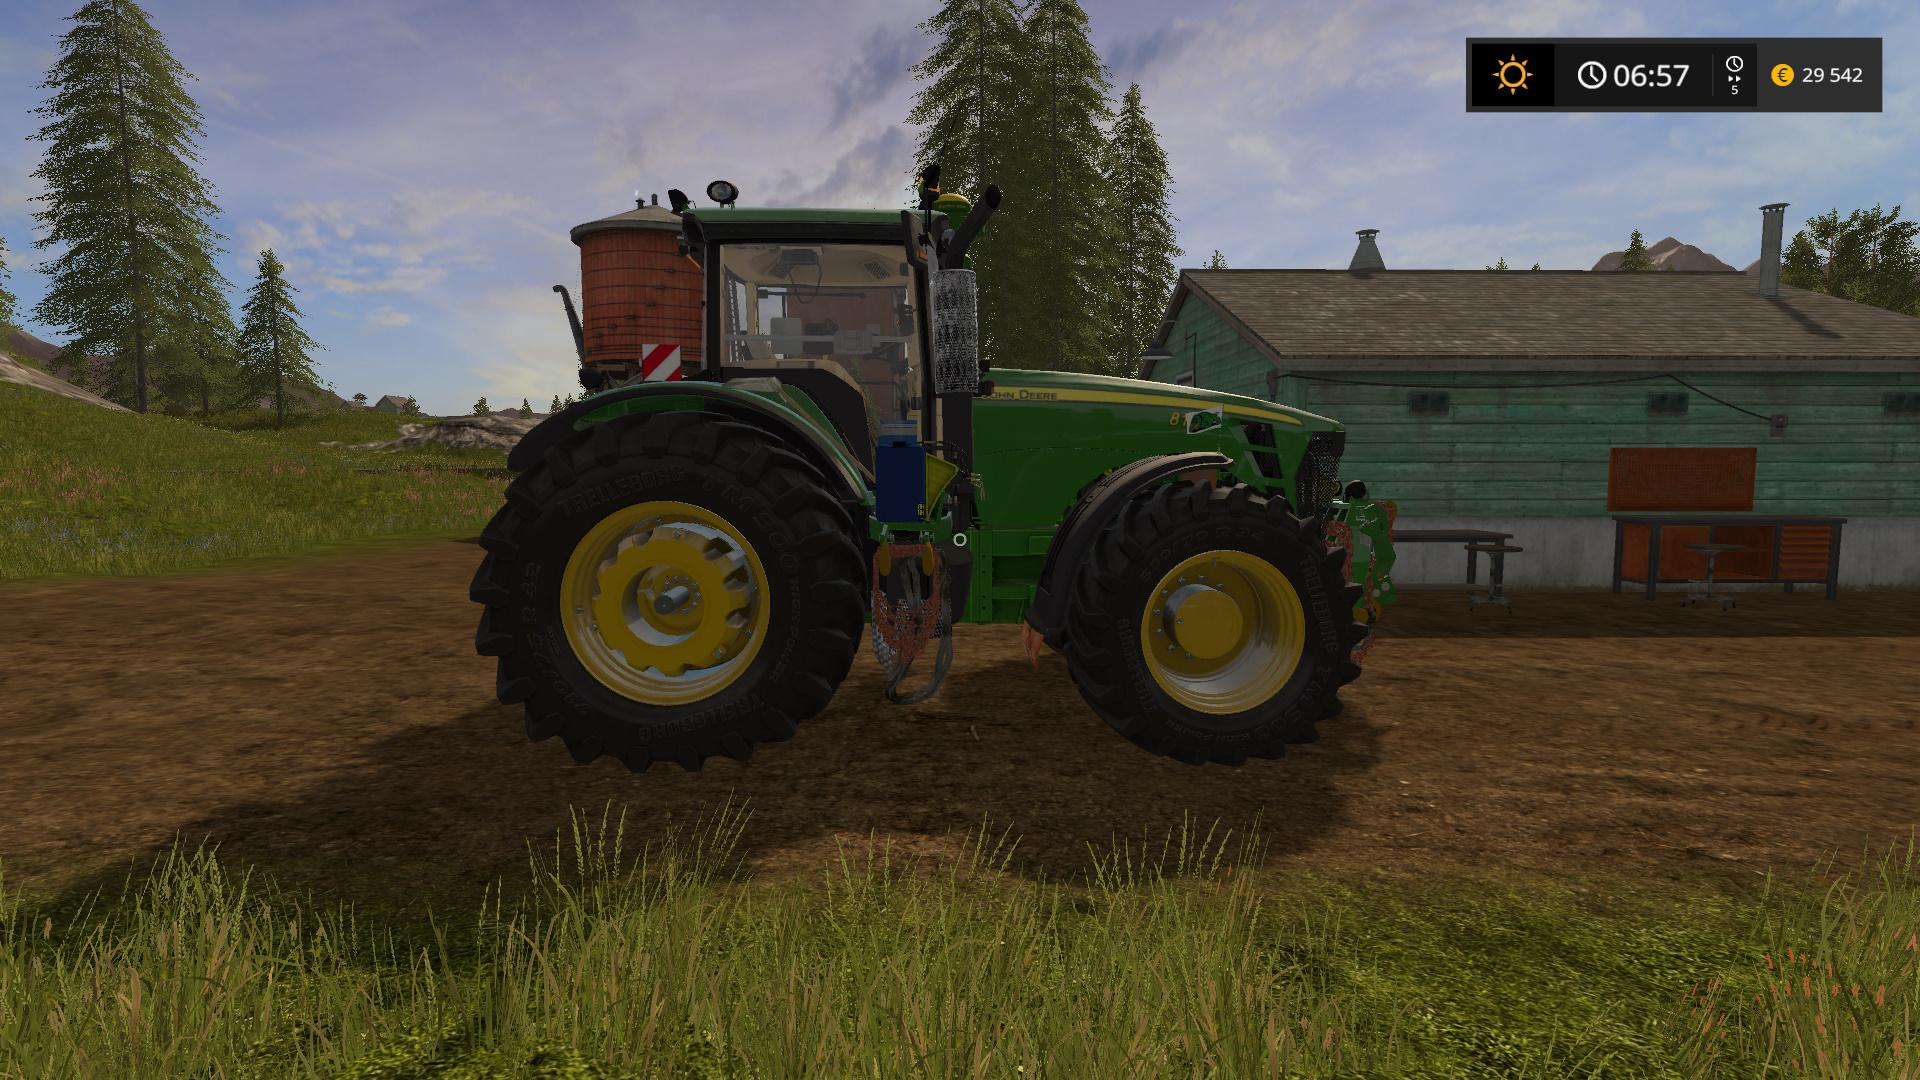 John Deere 8530 V23 Fs 17 Farming Simulator 17 Mod Fs 2017 Mod